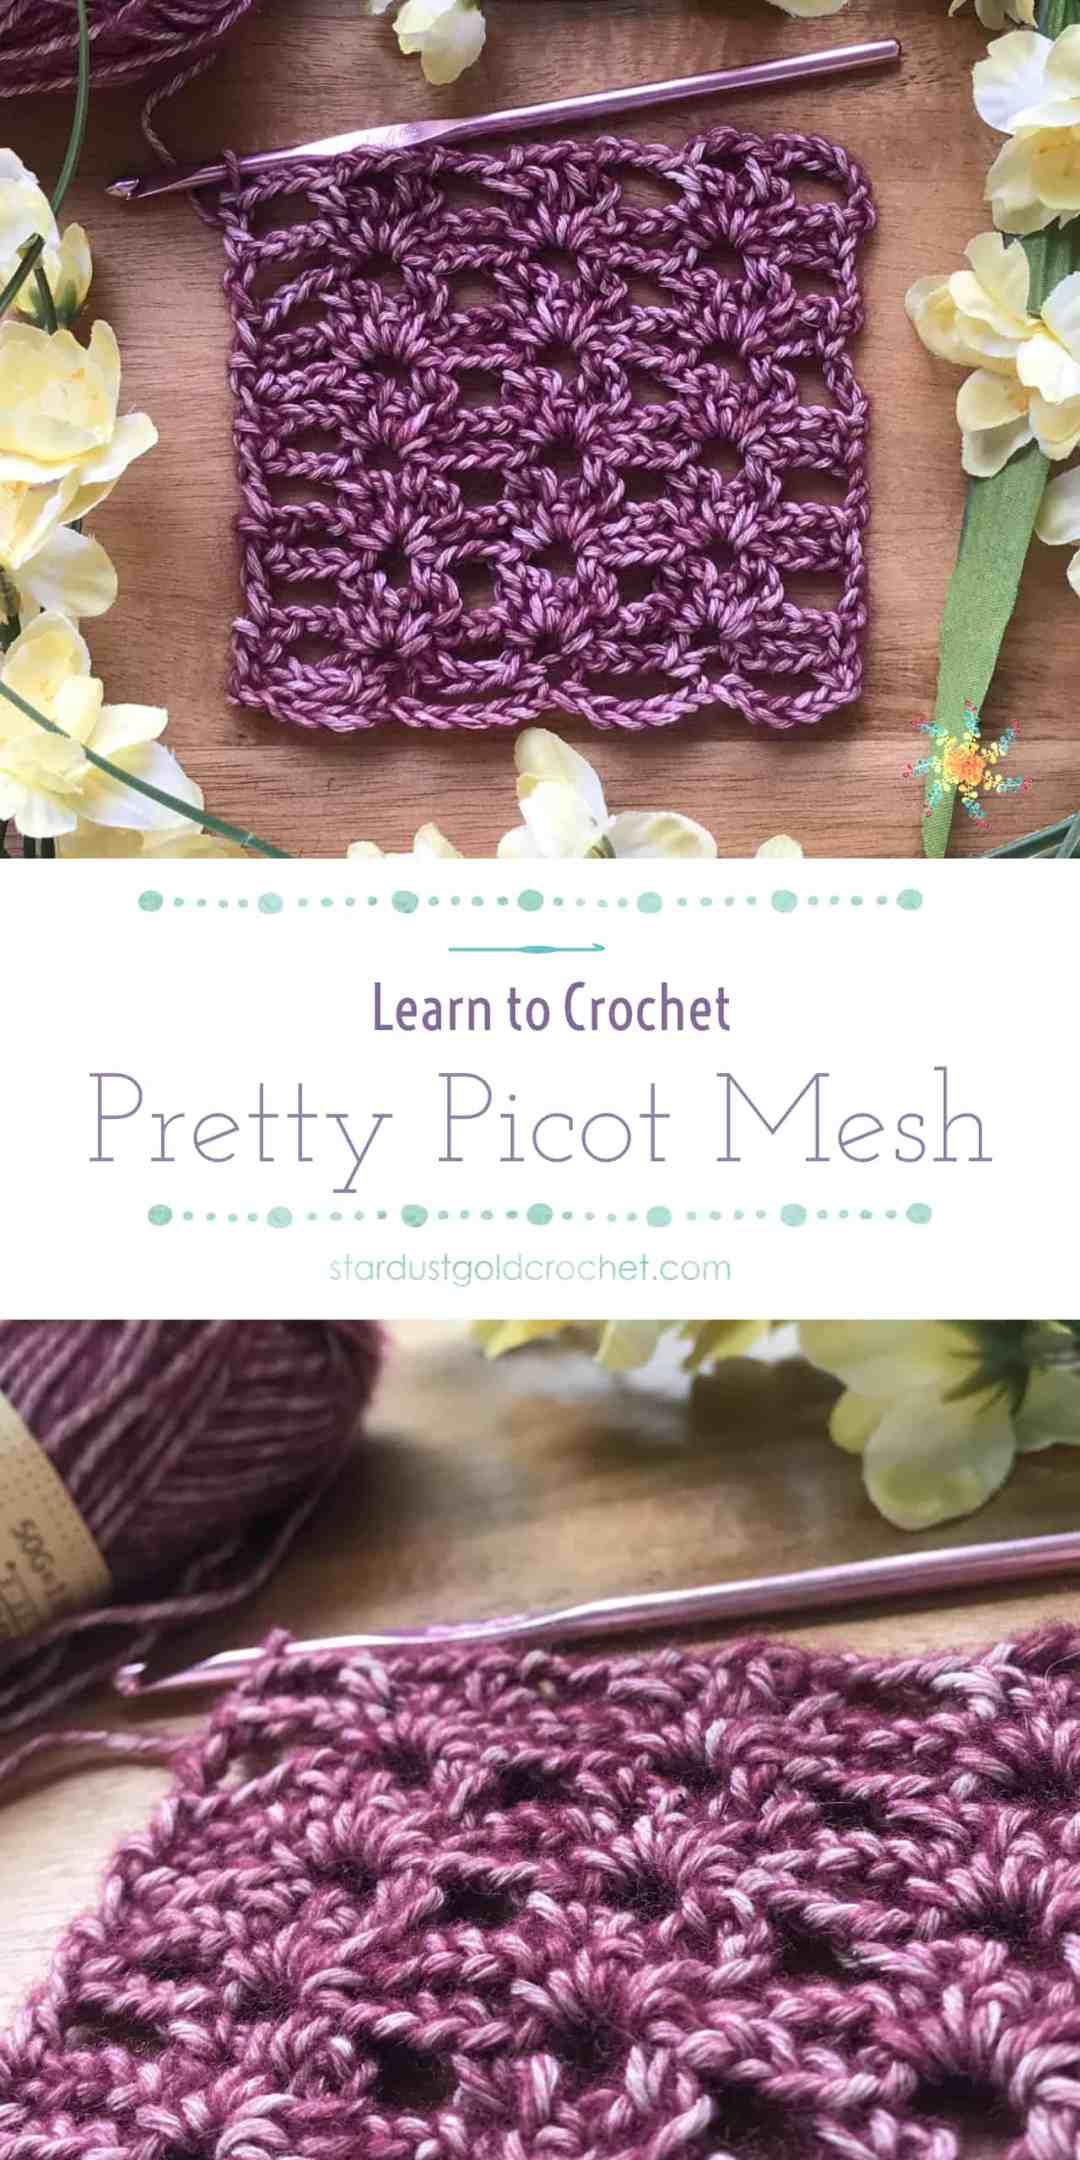 pretty picot mesh crochet